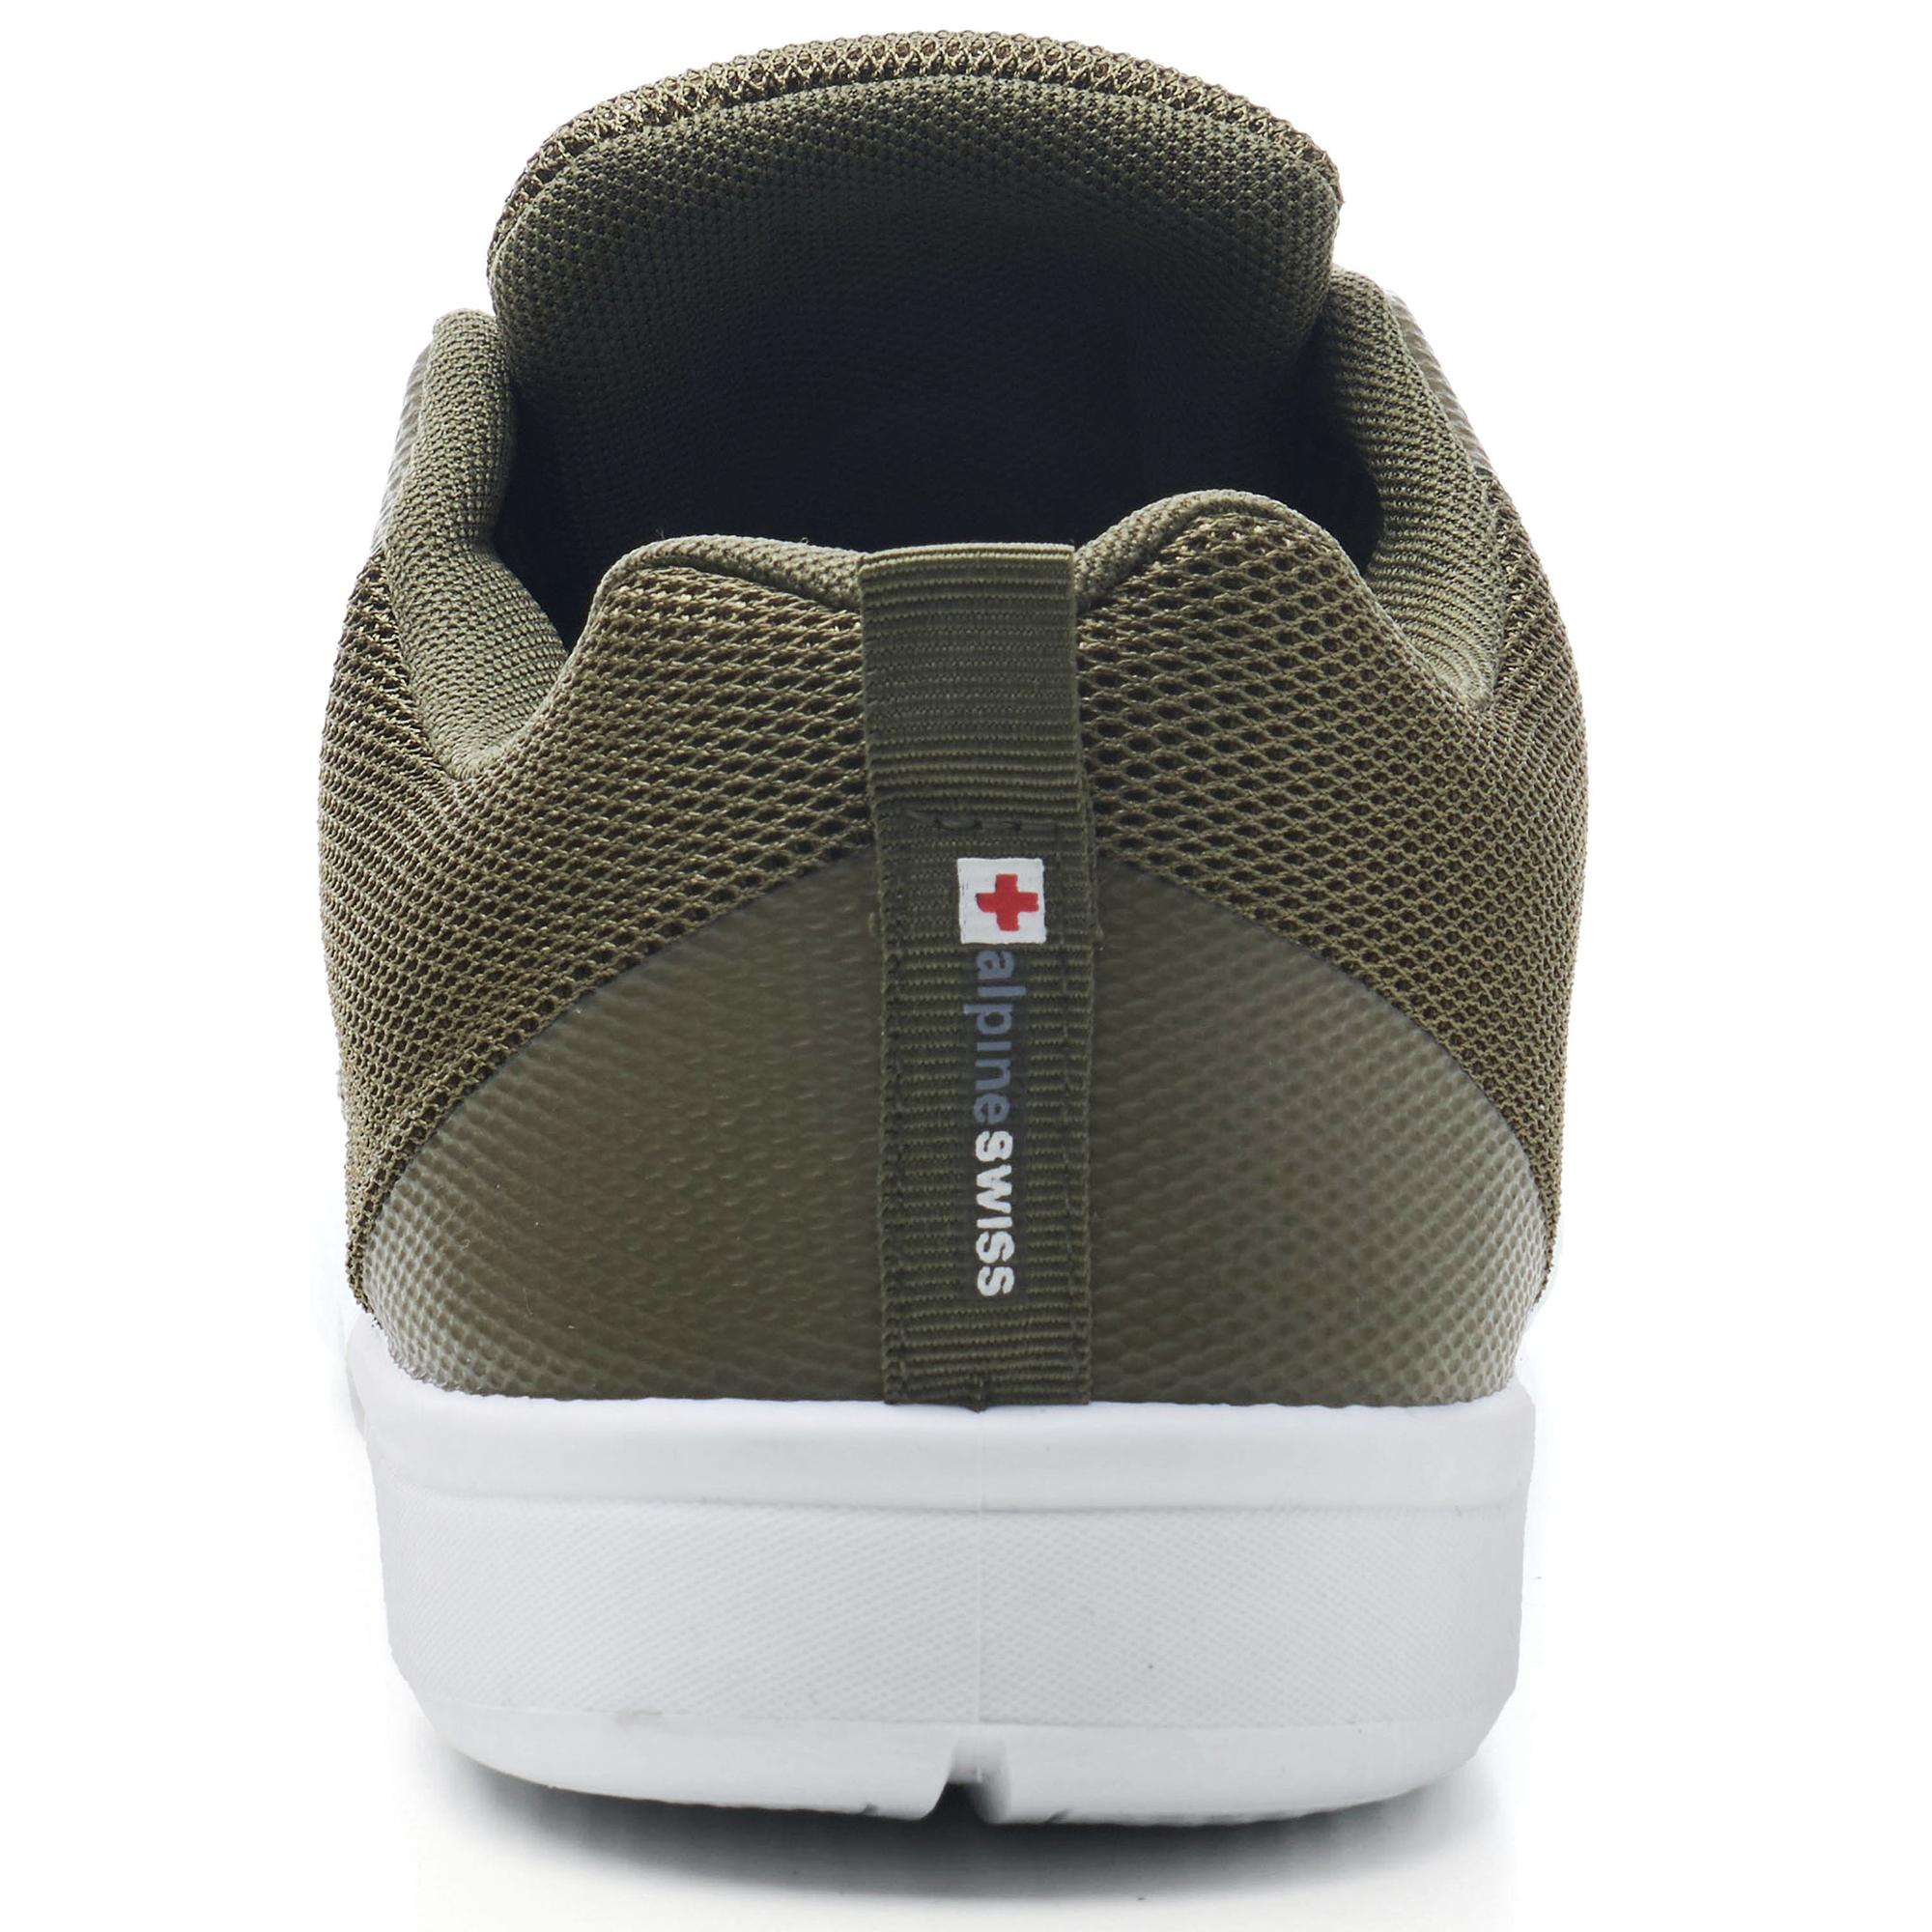 thumbnail 31 - Alpine Swiss Bolt Mesh Sneaker Casual Light Shoes For Men With Shoe Bag